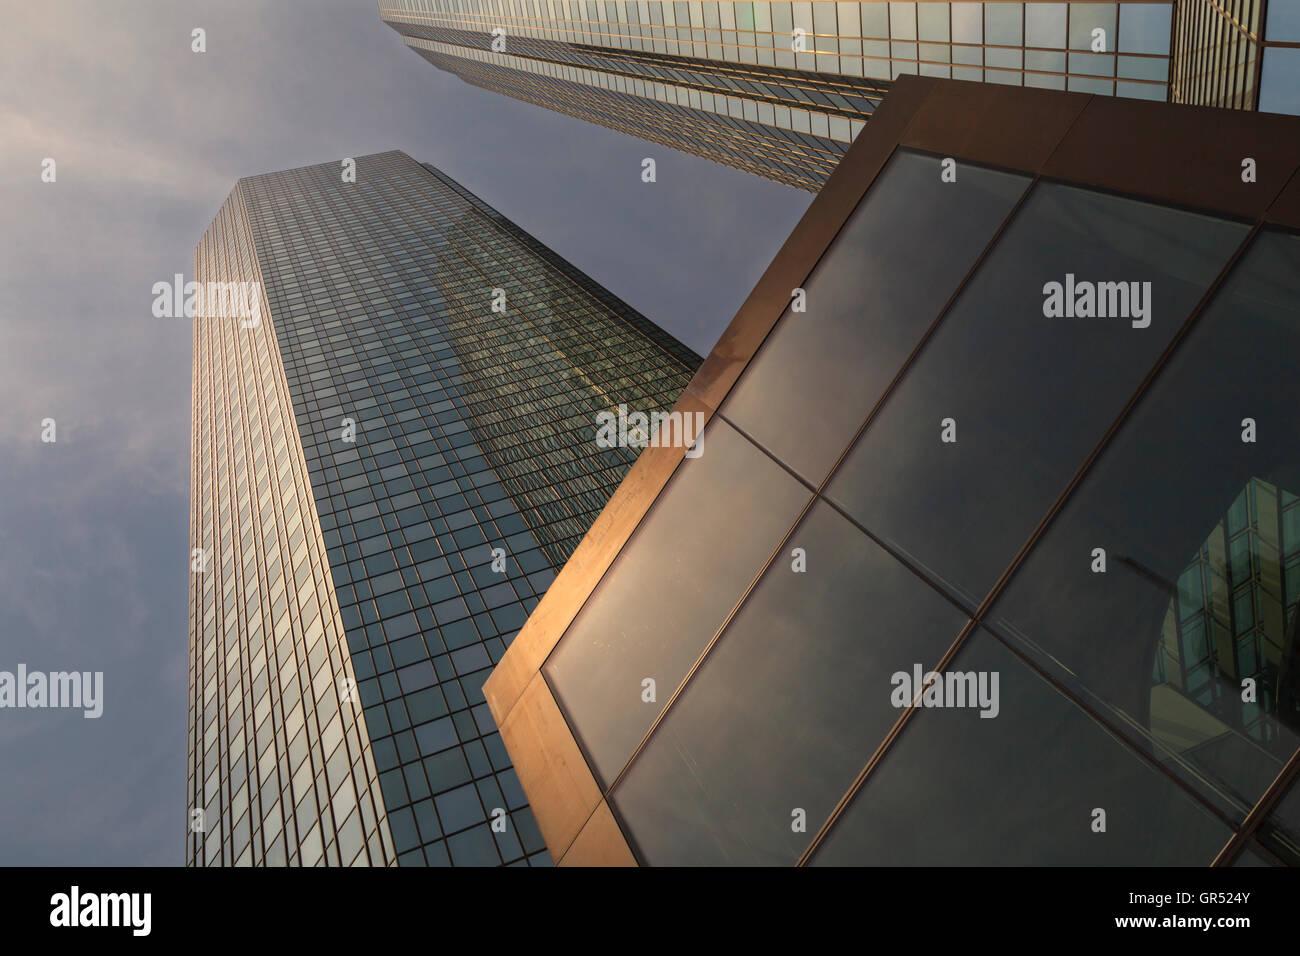 Deutsche Bank twin towers from below, Banking and Financial District, Frankfurt - Stock Image